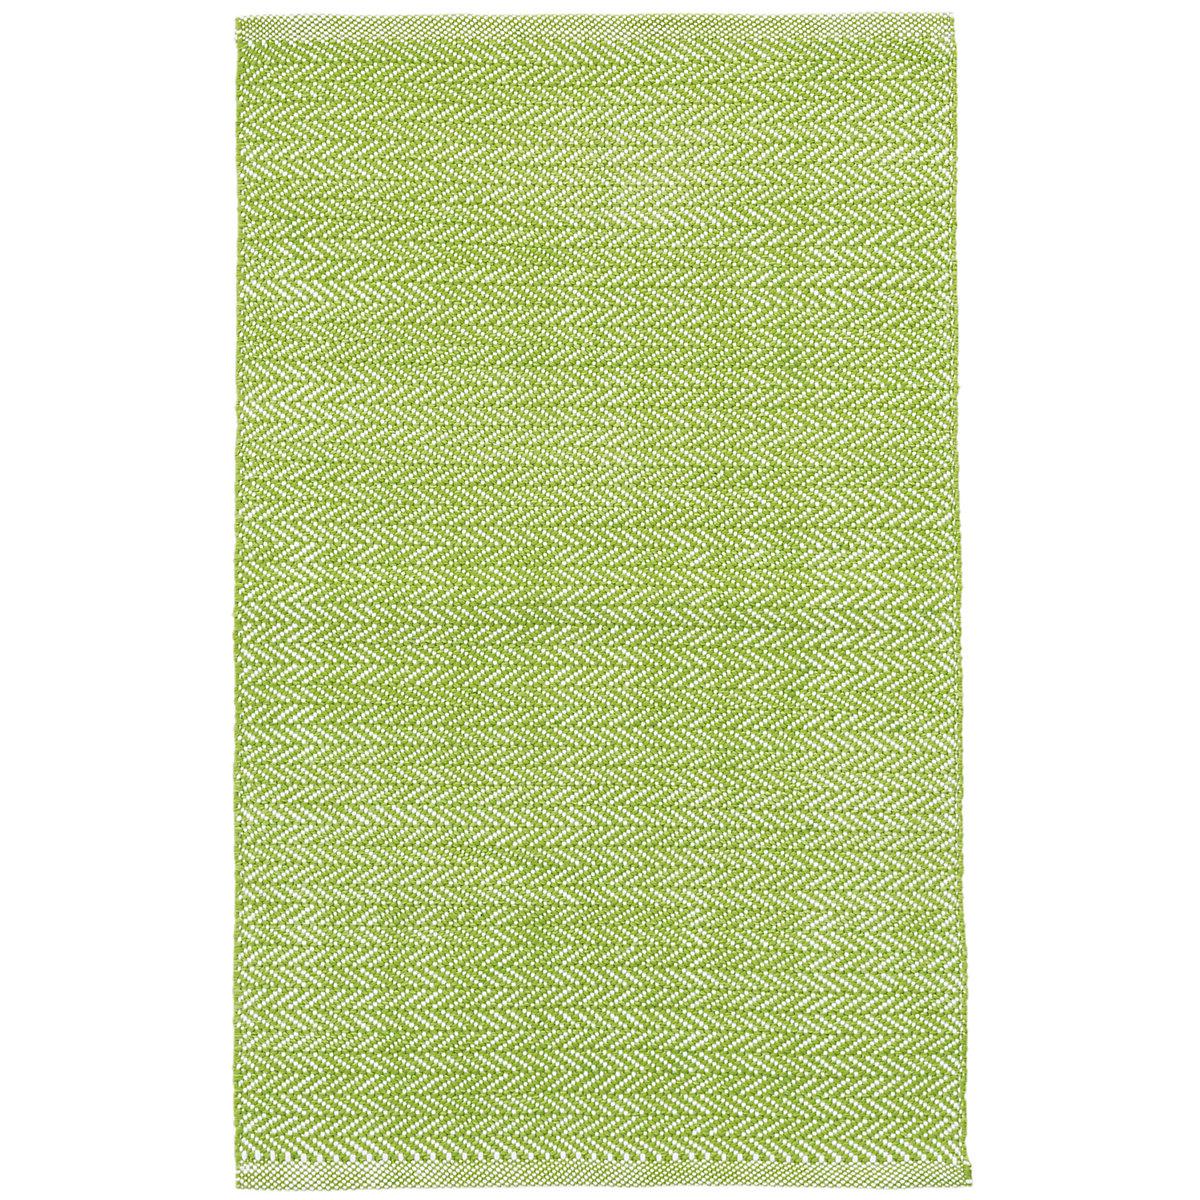 Herringbone Rugs, Area Rugs and Carpets | Dash & Albert